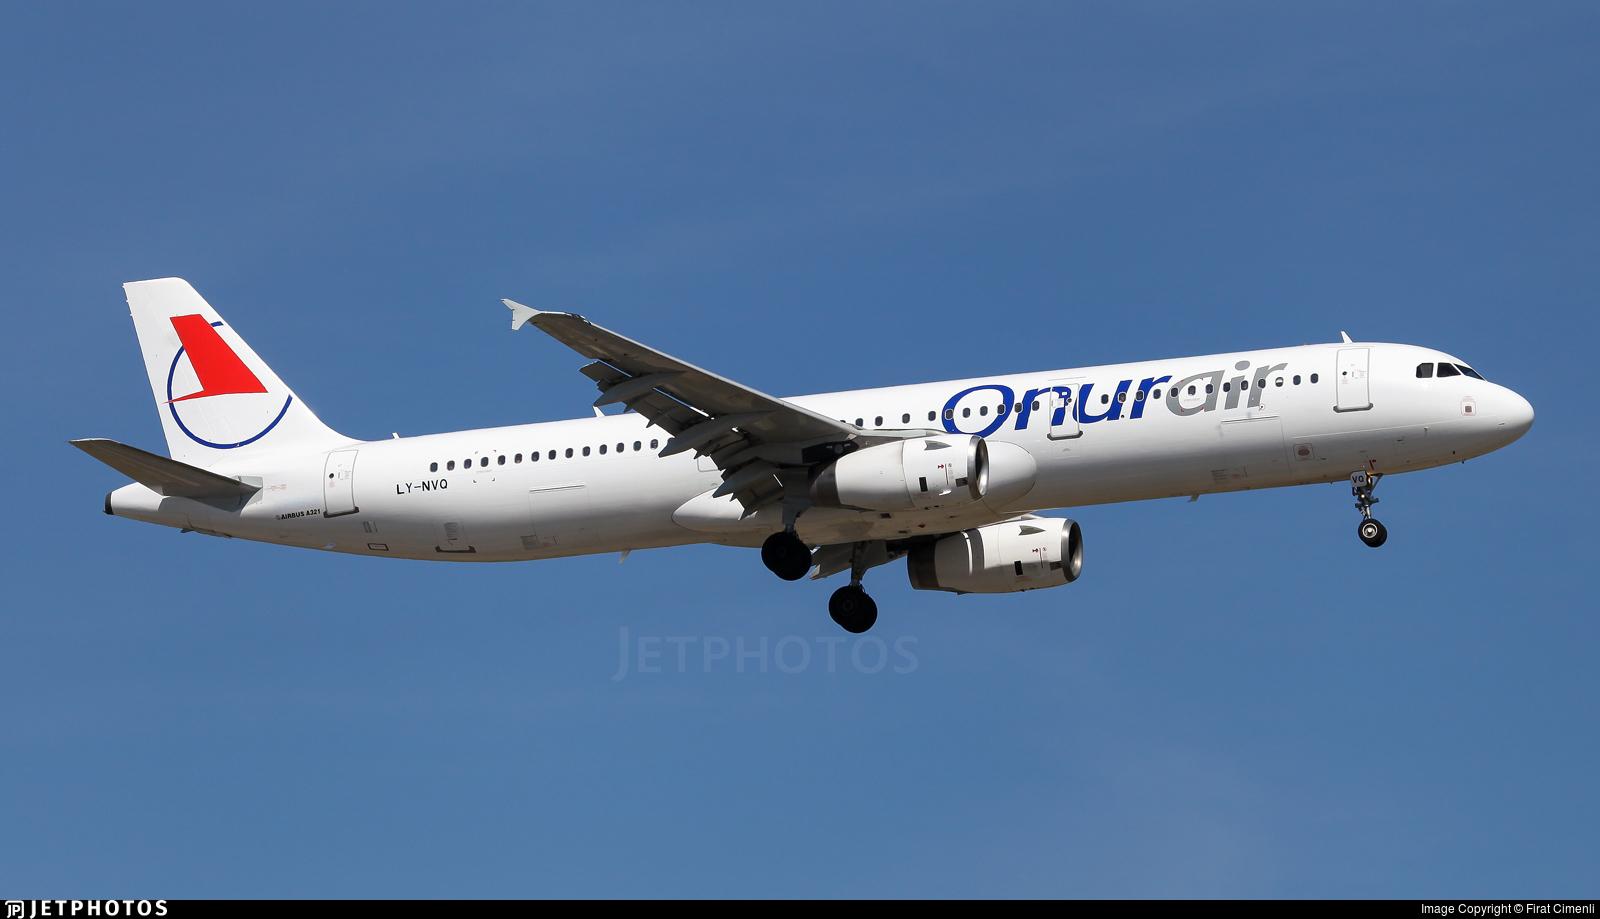 LY-NVQ - Airbus A321-231 - Onur Air (Avion Express)